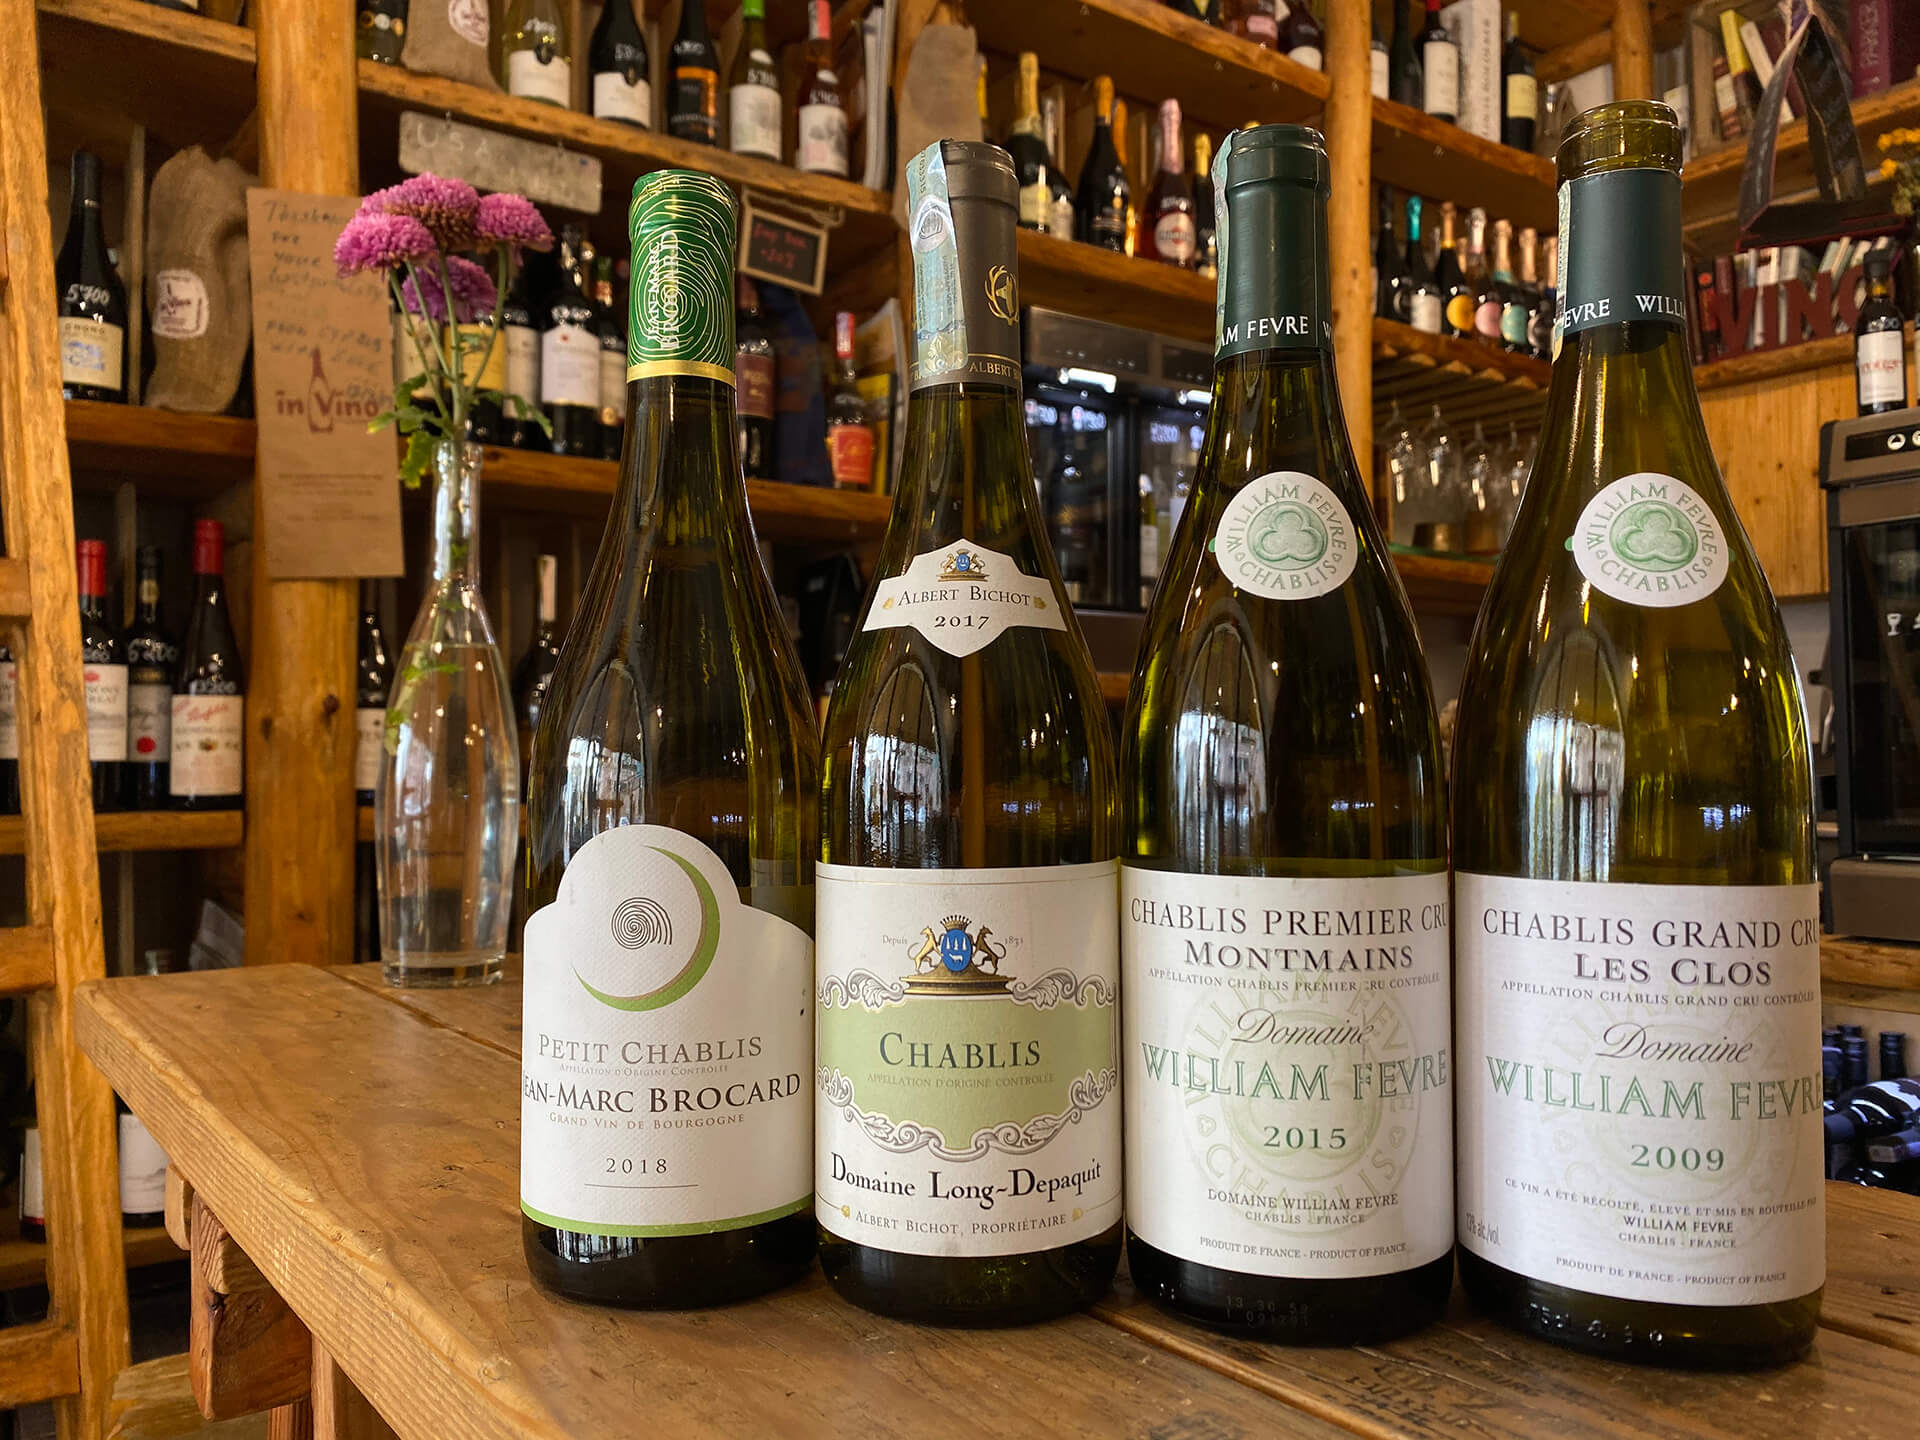 White Wines Of France: Chablis, Burgundy